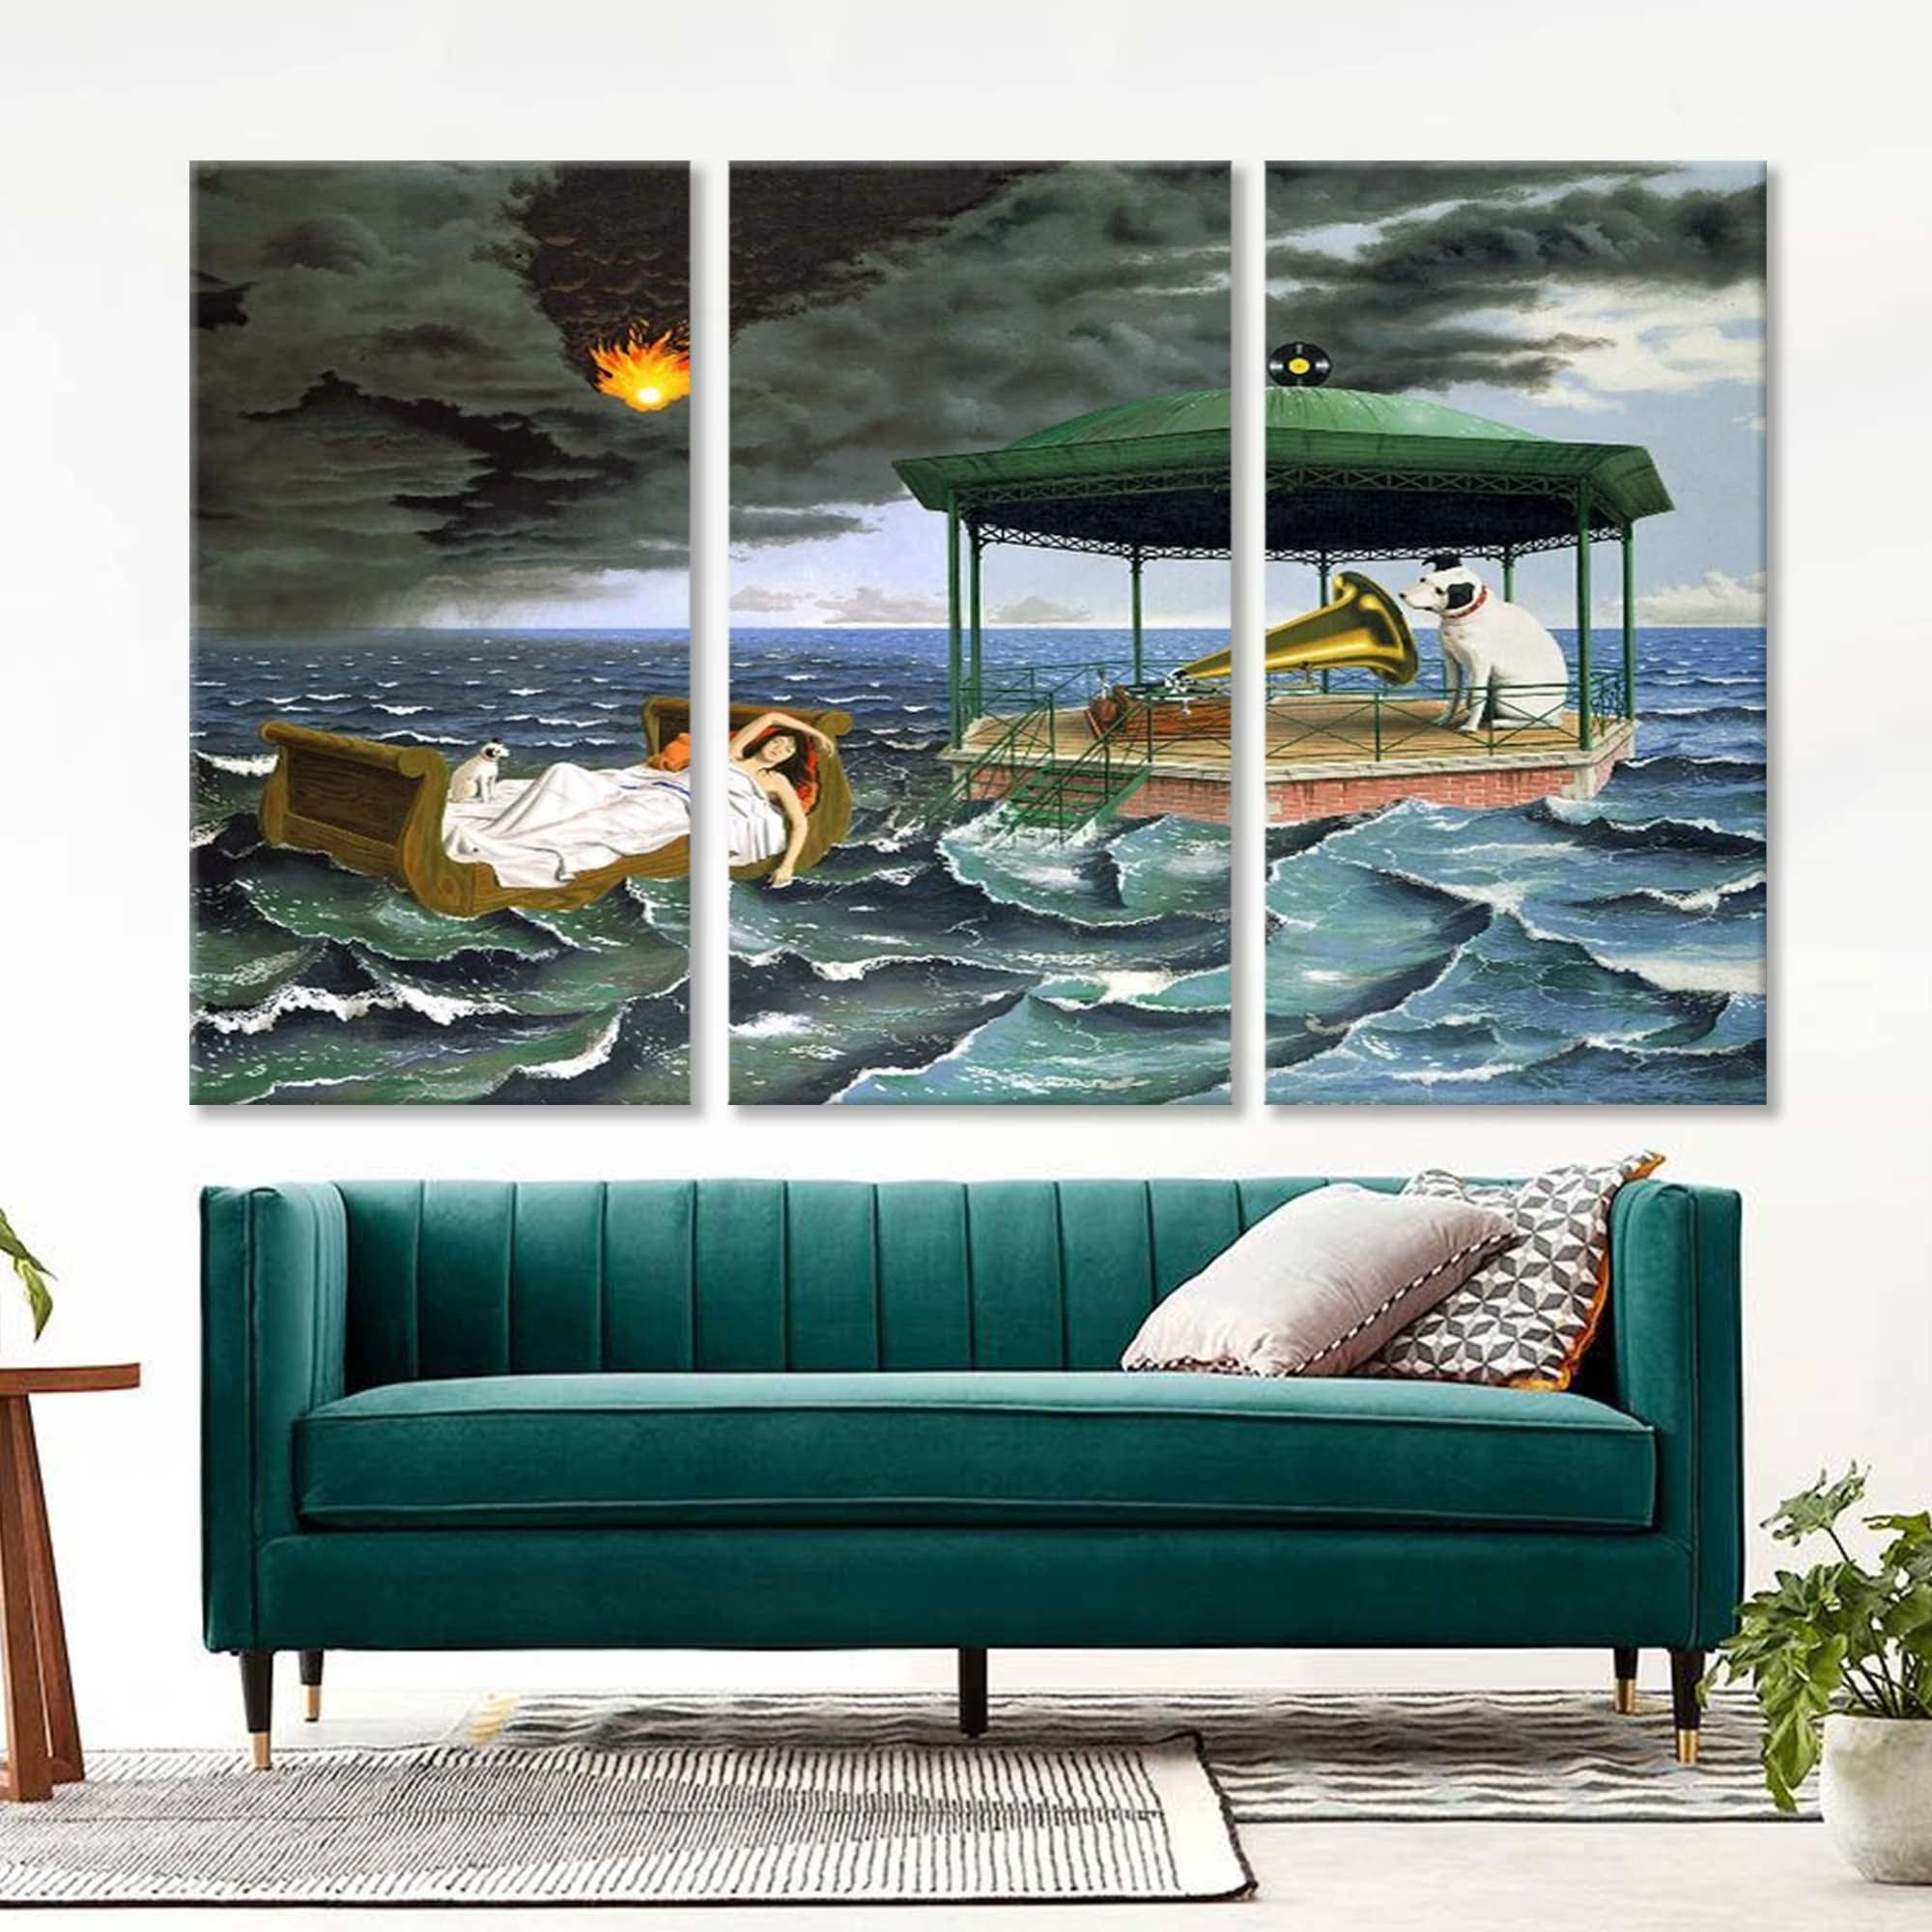 Itlyw Xai O32m Living room surrealsim realism